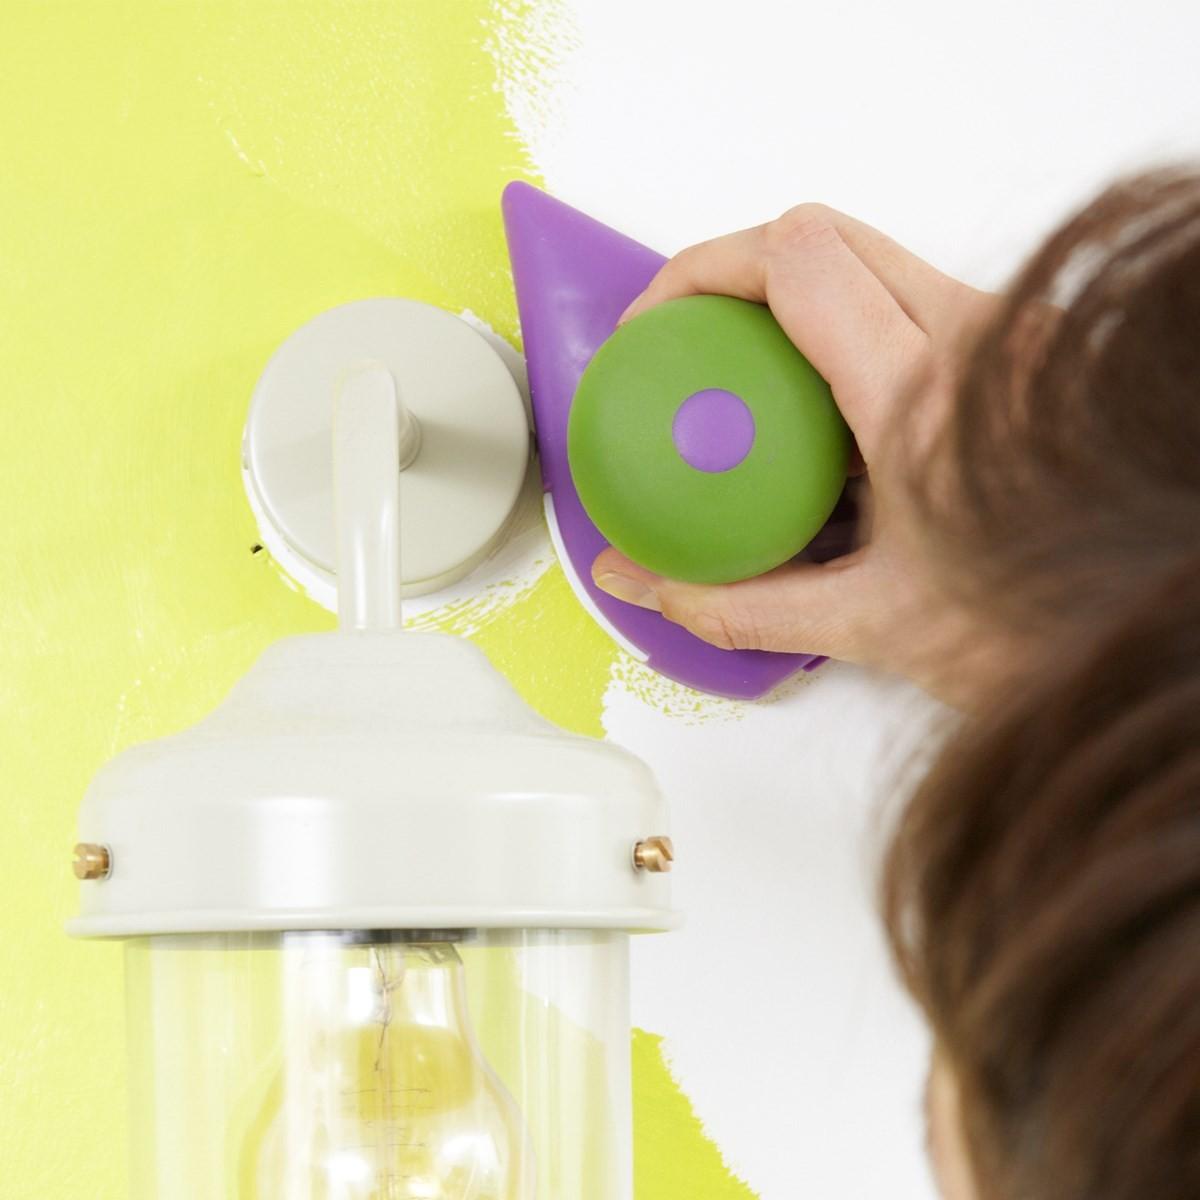 Point N Paint Kit Para Pintar Parede Kit Completo Agiliza Pintura